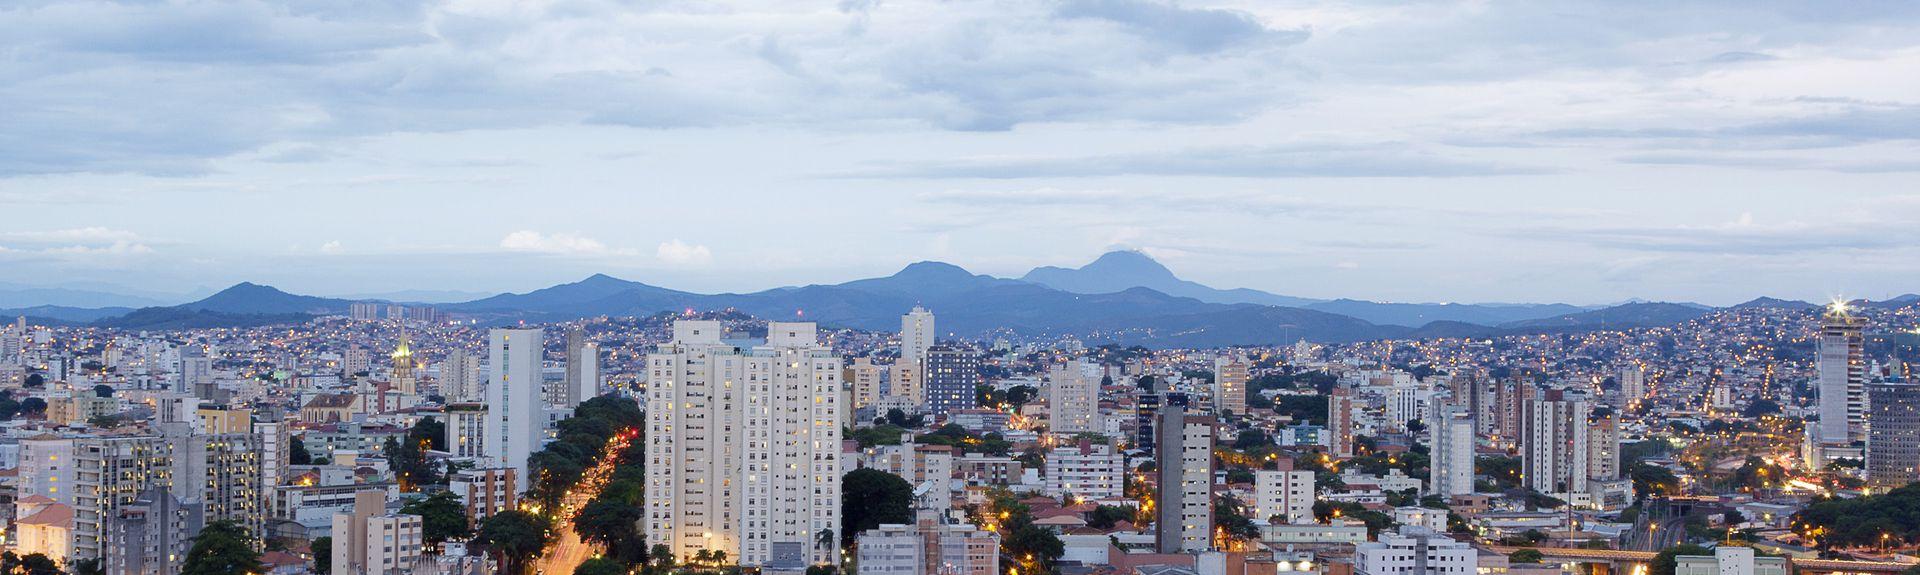 Belo Horizonte, Regione sudorientale, Brasile